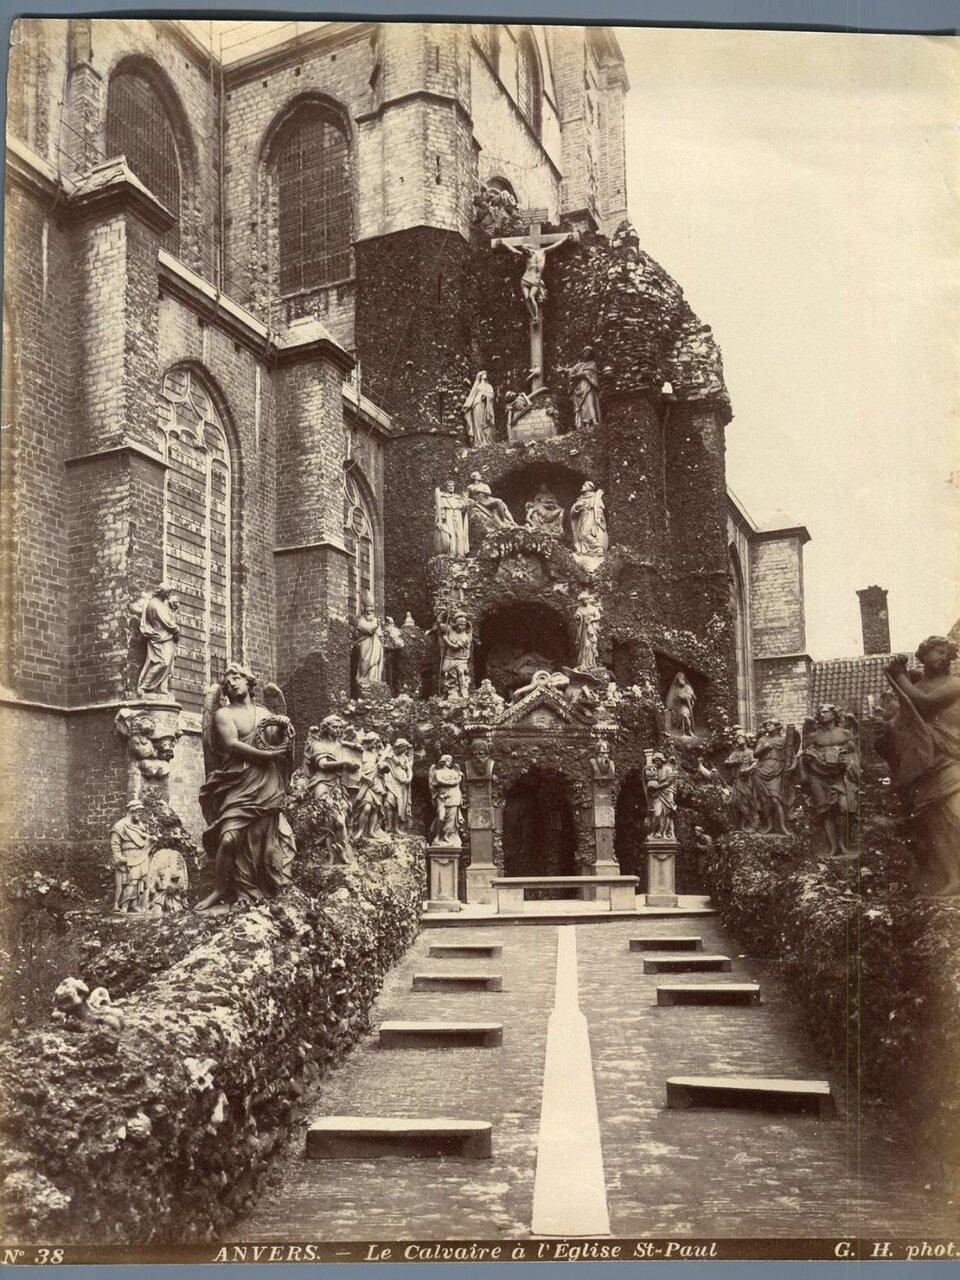 Антверпен. Церковь Св. Павла. 1880.